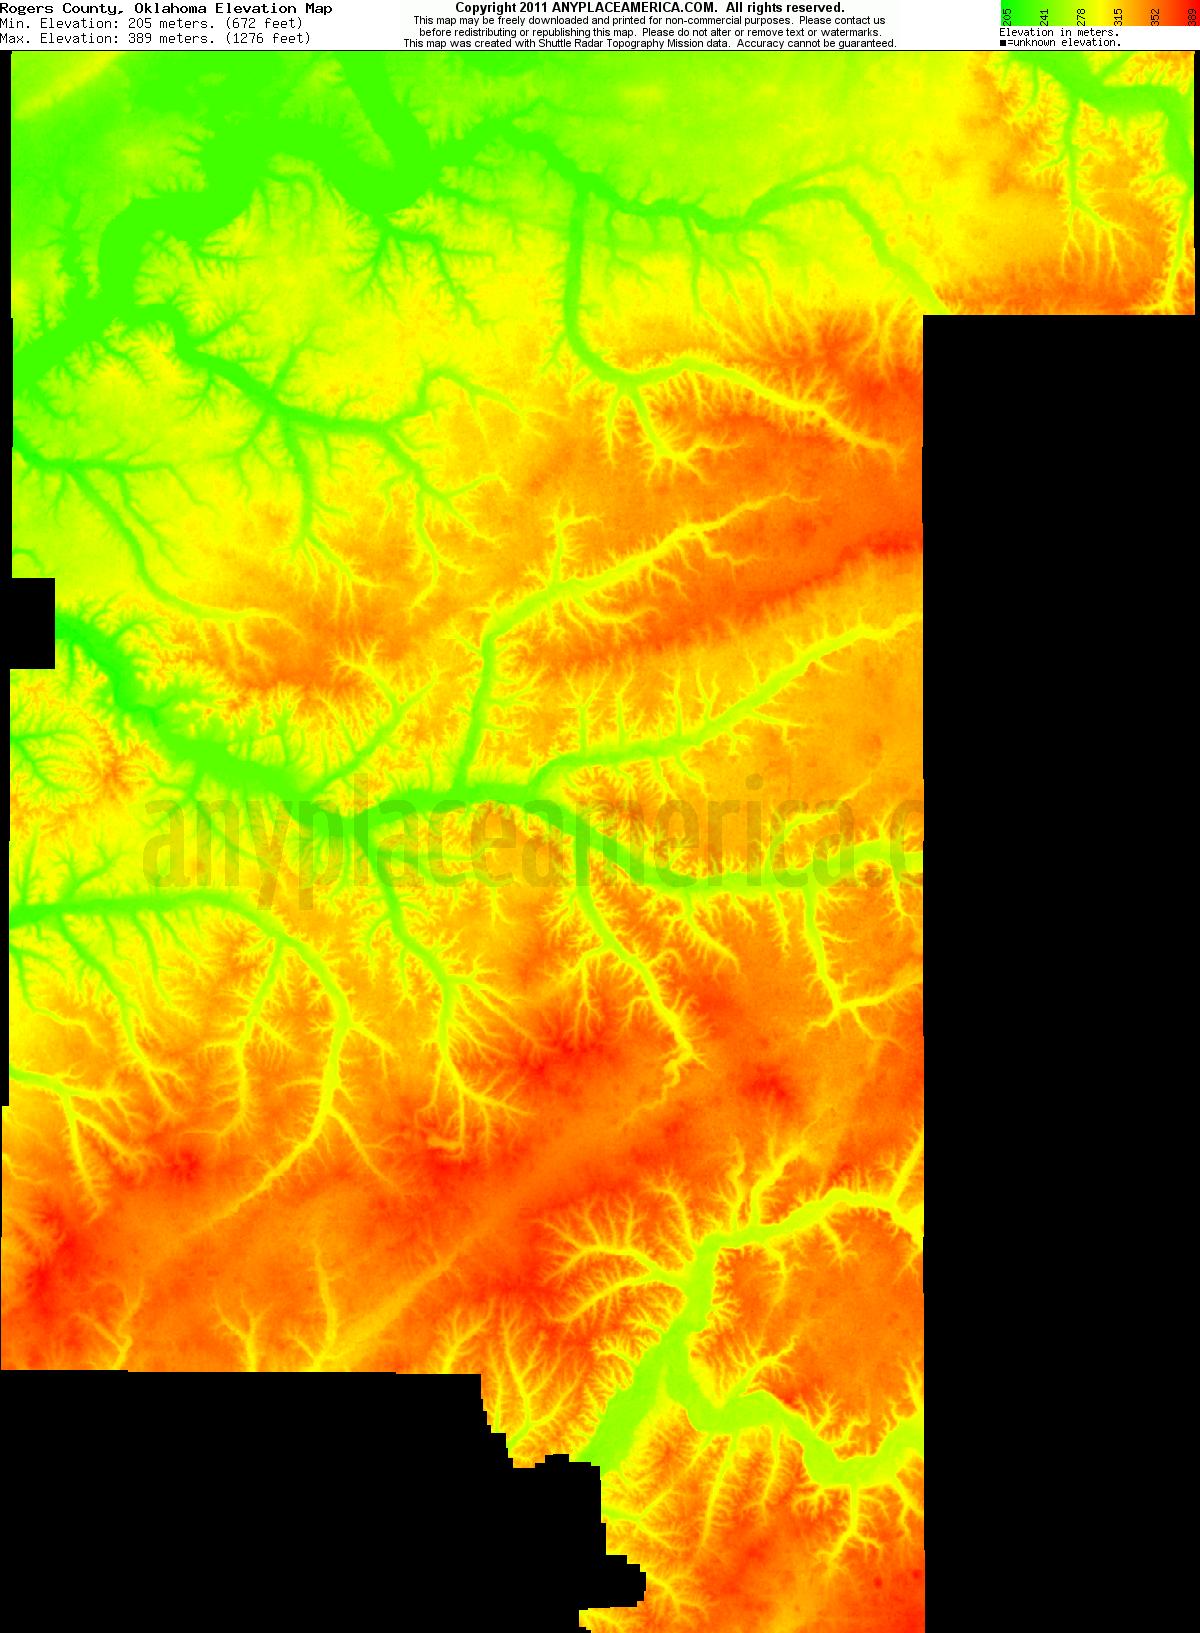 Free Rogers County, Oklahoma Topo Maps & Elevations